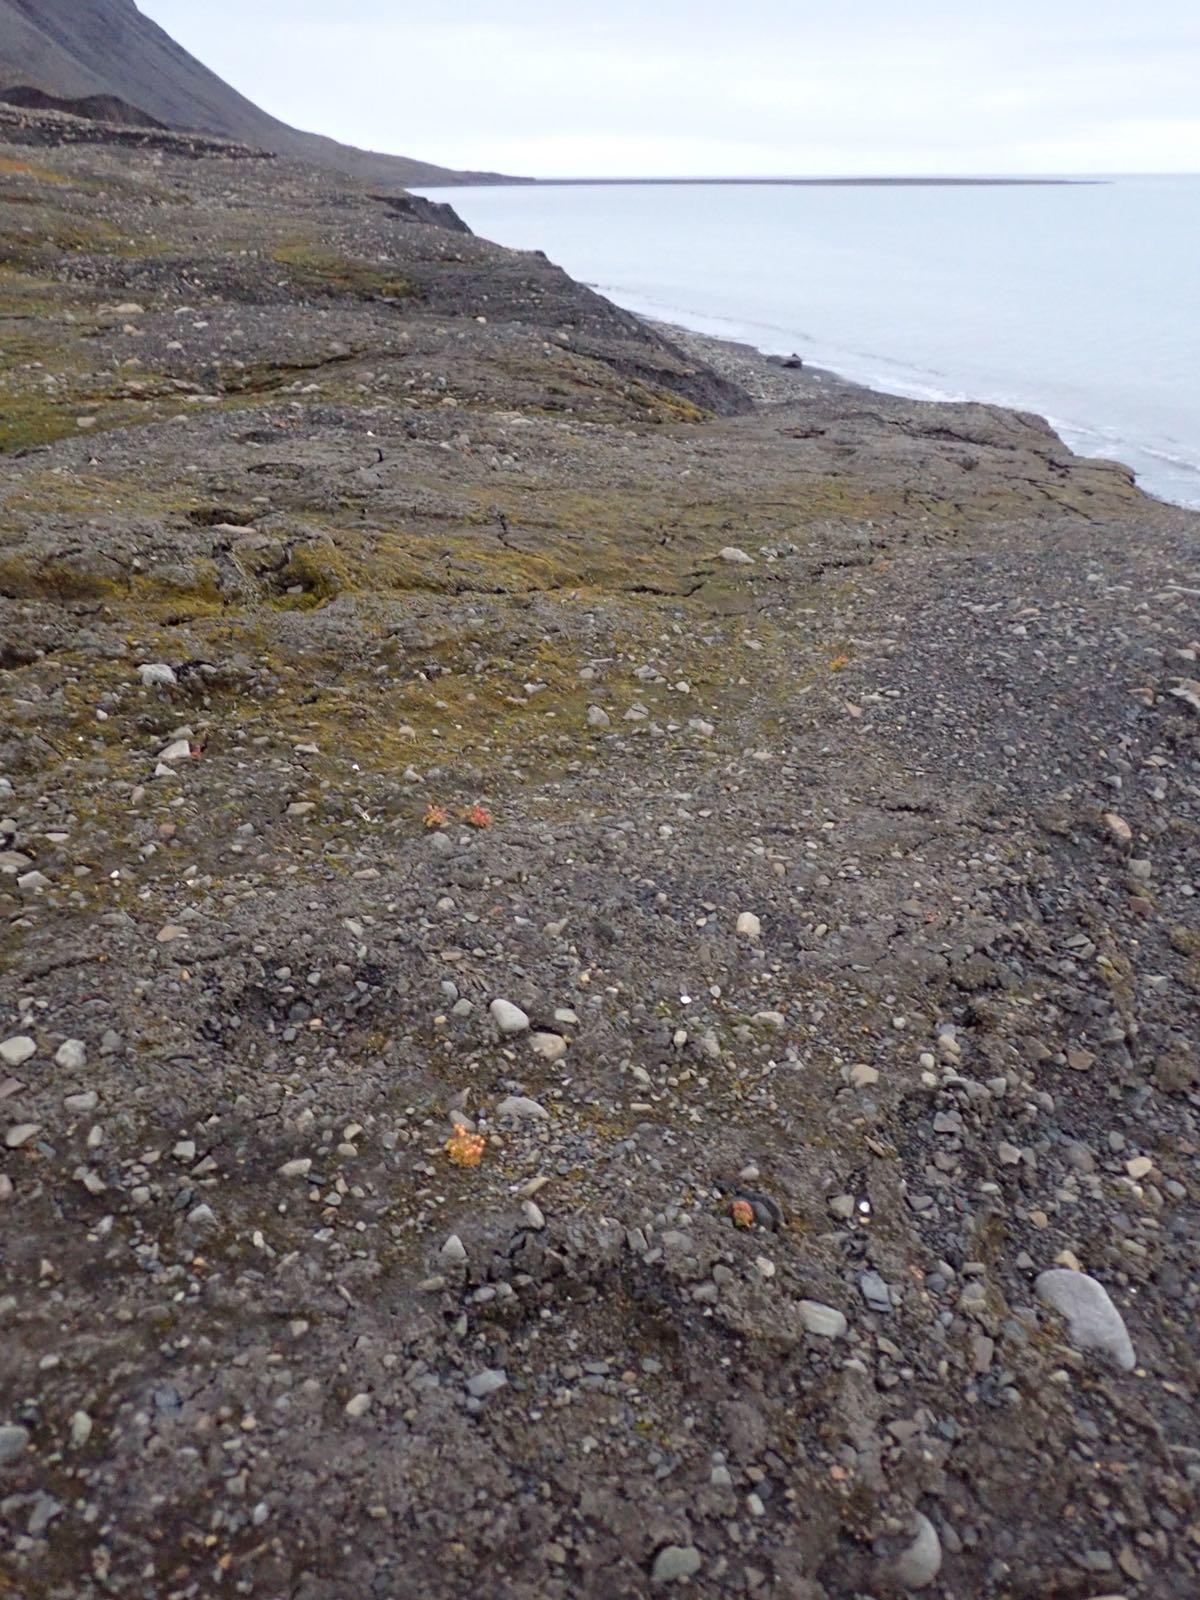 Polar bear footprints in the tundra (photo by Martine van den Heuvel-Greve)